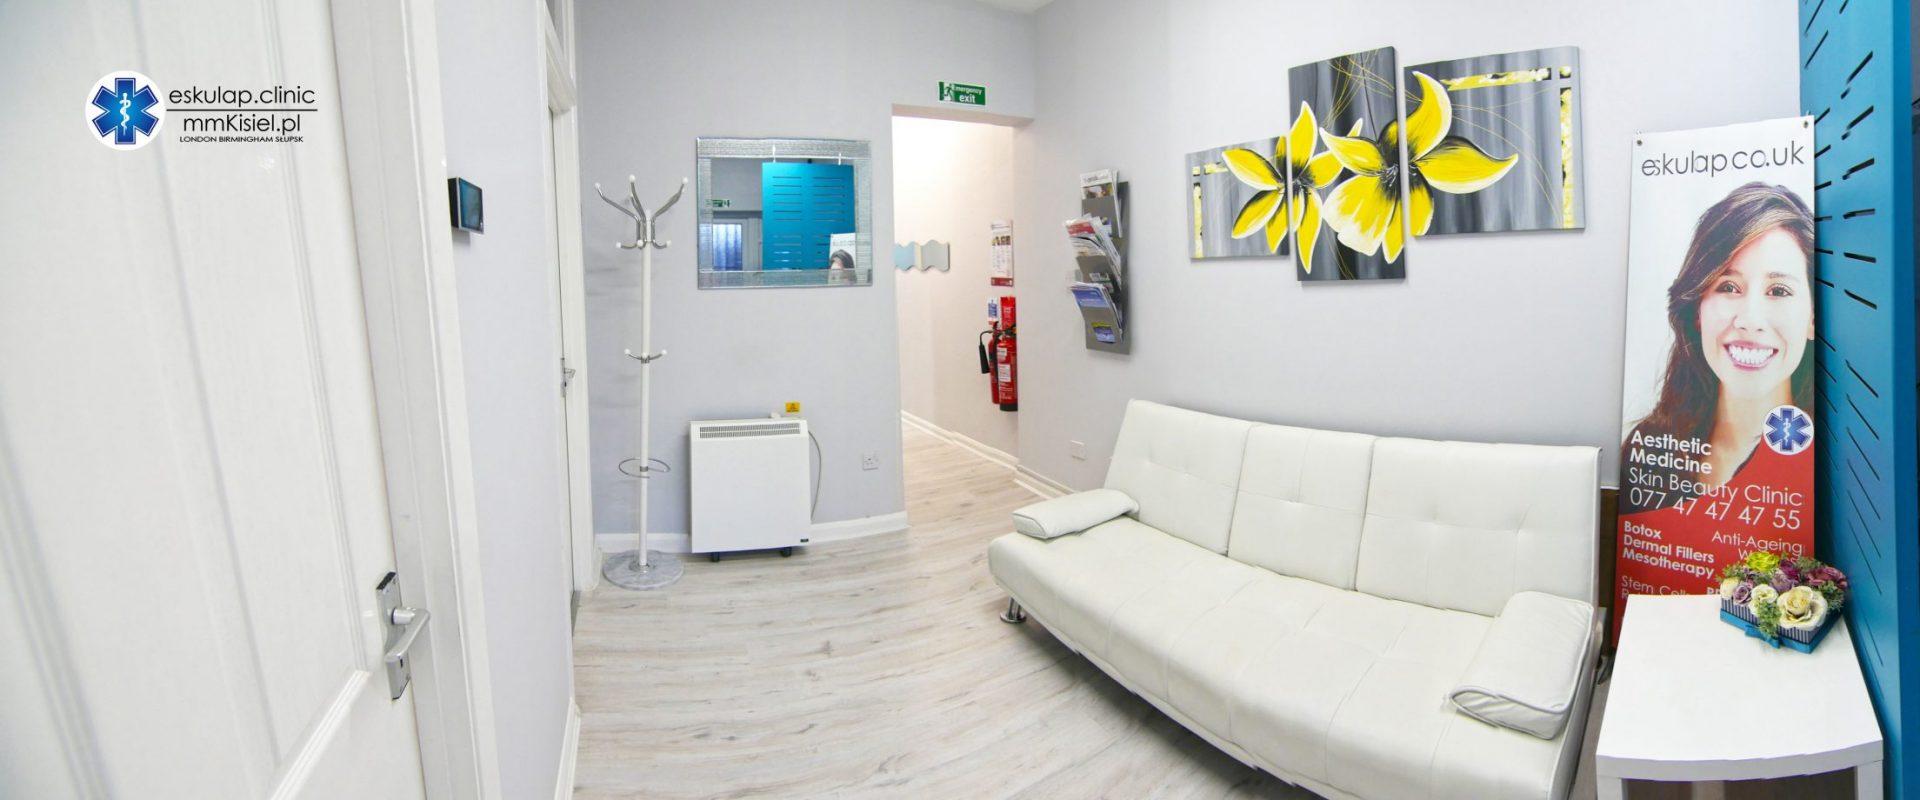 Gallery Aesthetic Medicine Skin Clinic Eskulap